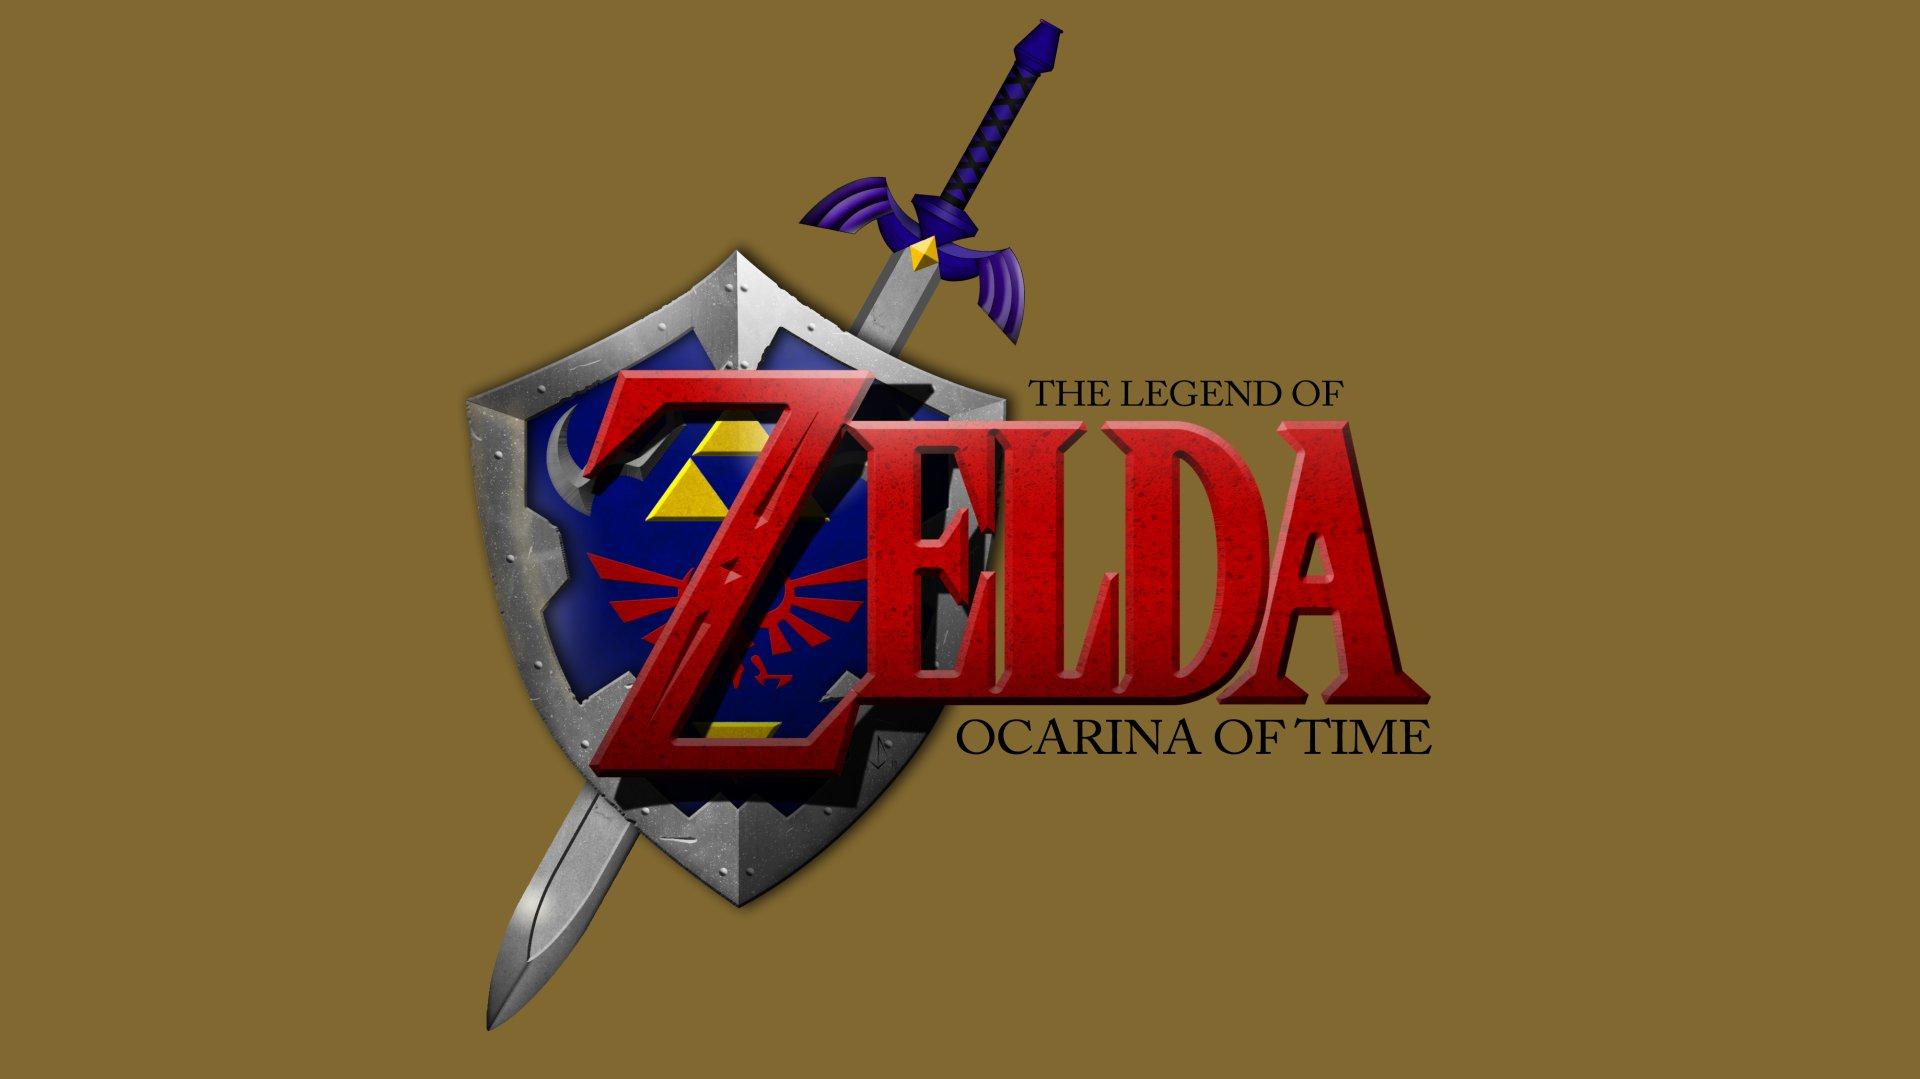 Legend Of Zelda Wallpaper Iphone X The Legend Of Zelda Ocarina Of Time 4k Ultra Hd Wallpaper